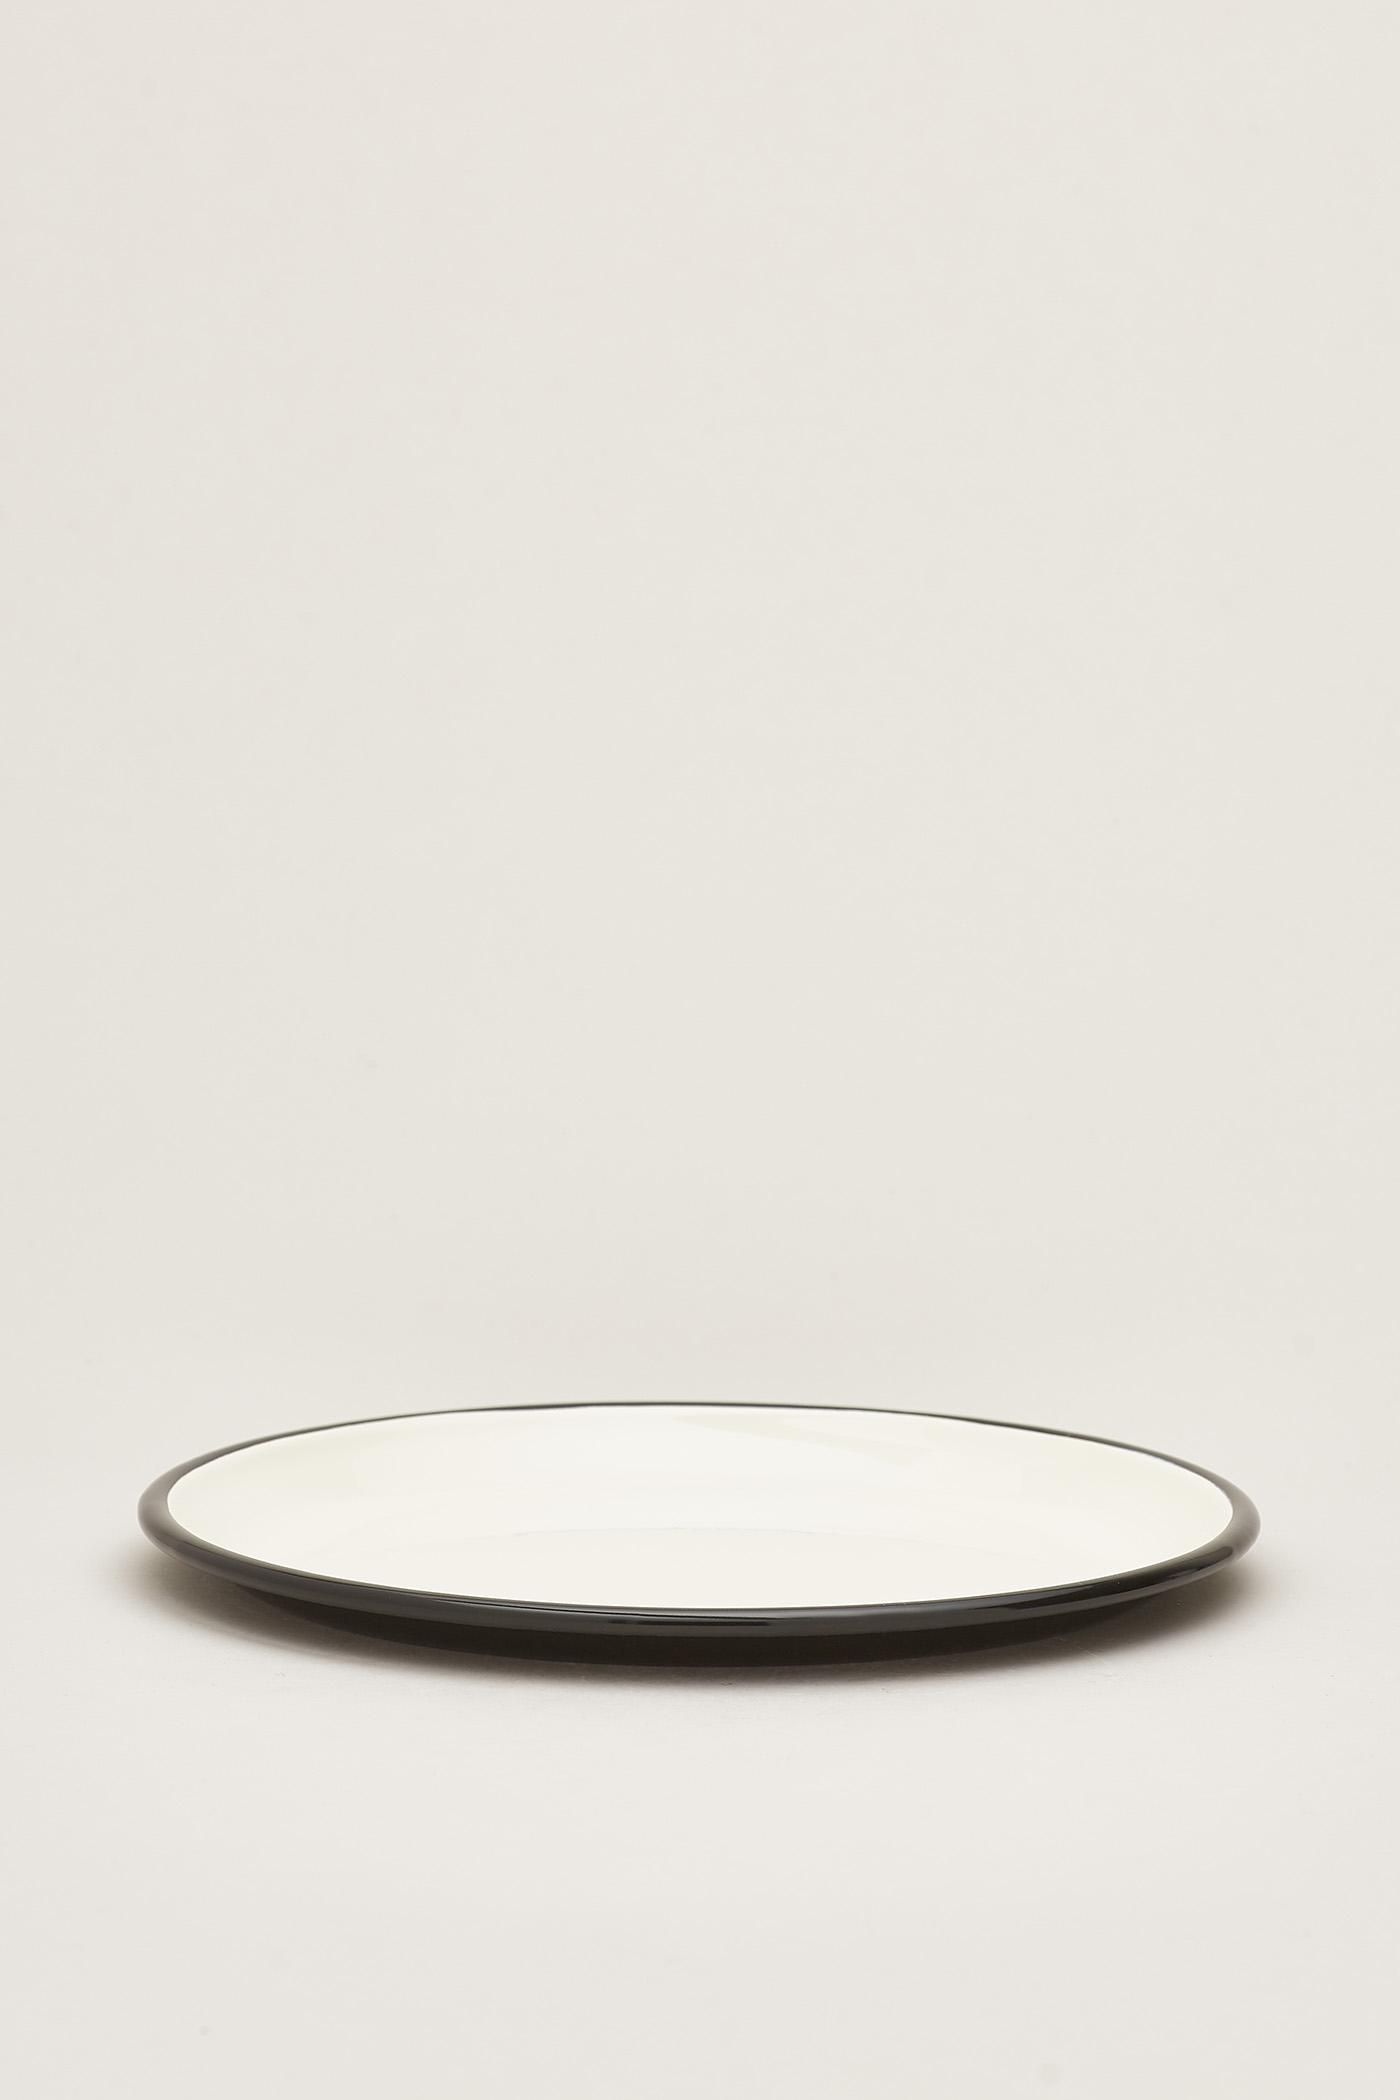 Rolf Enamel Large Plate